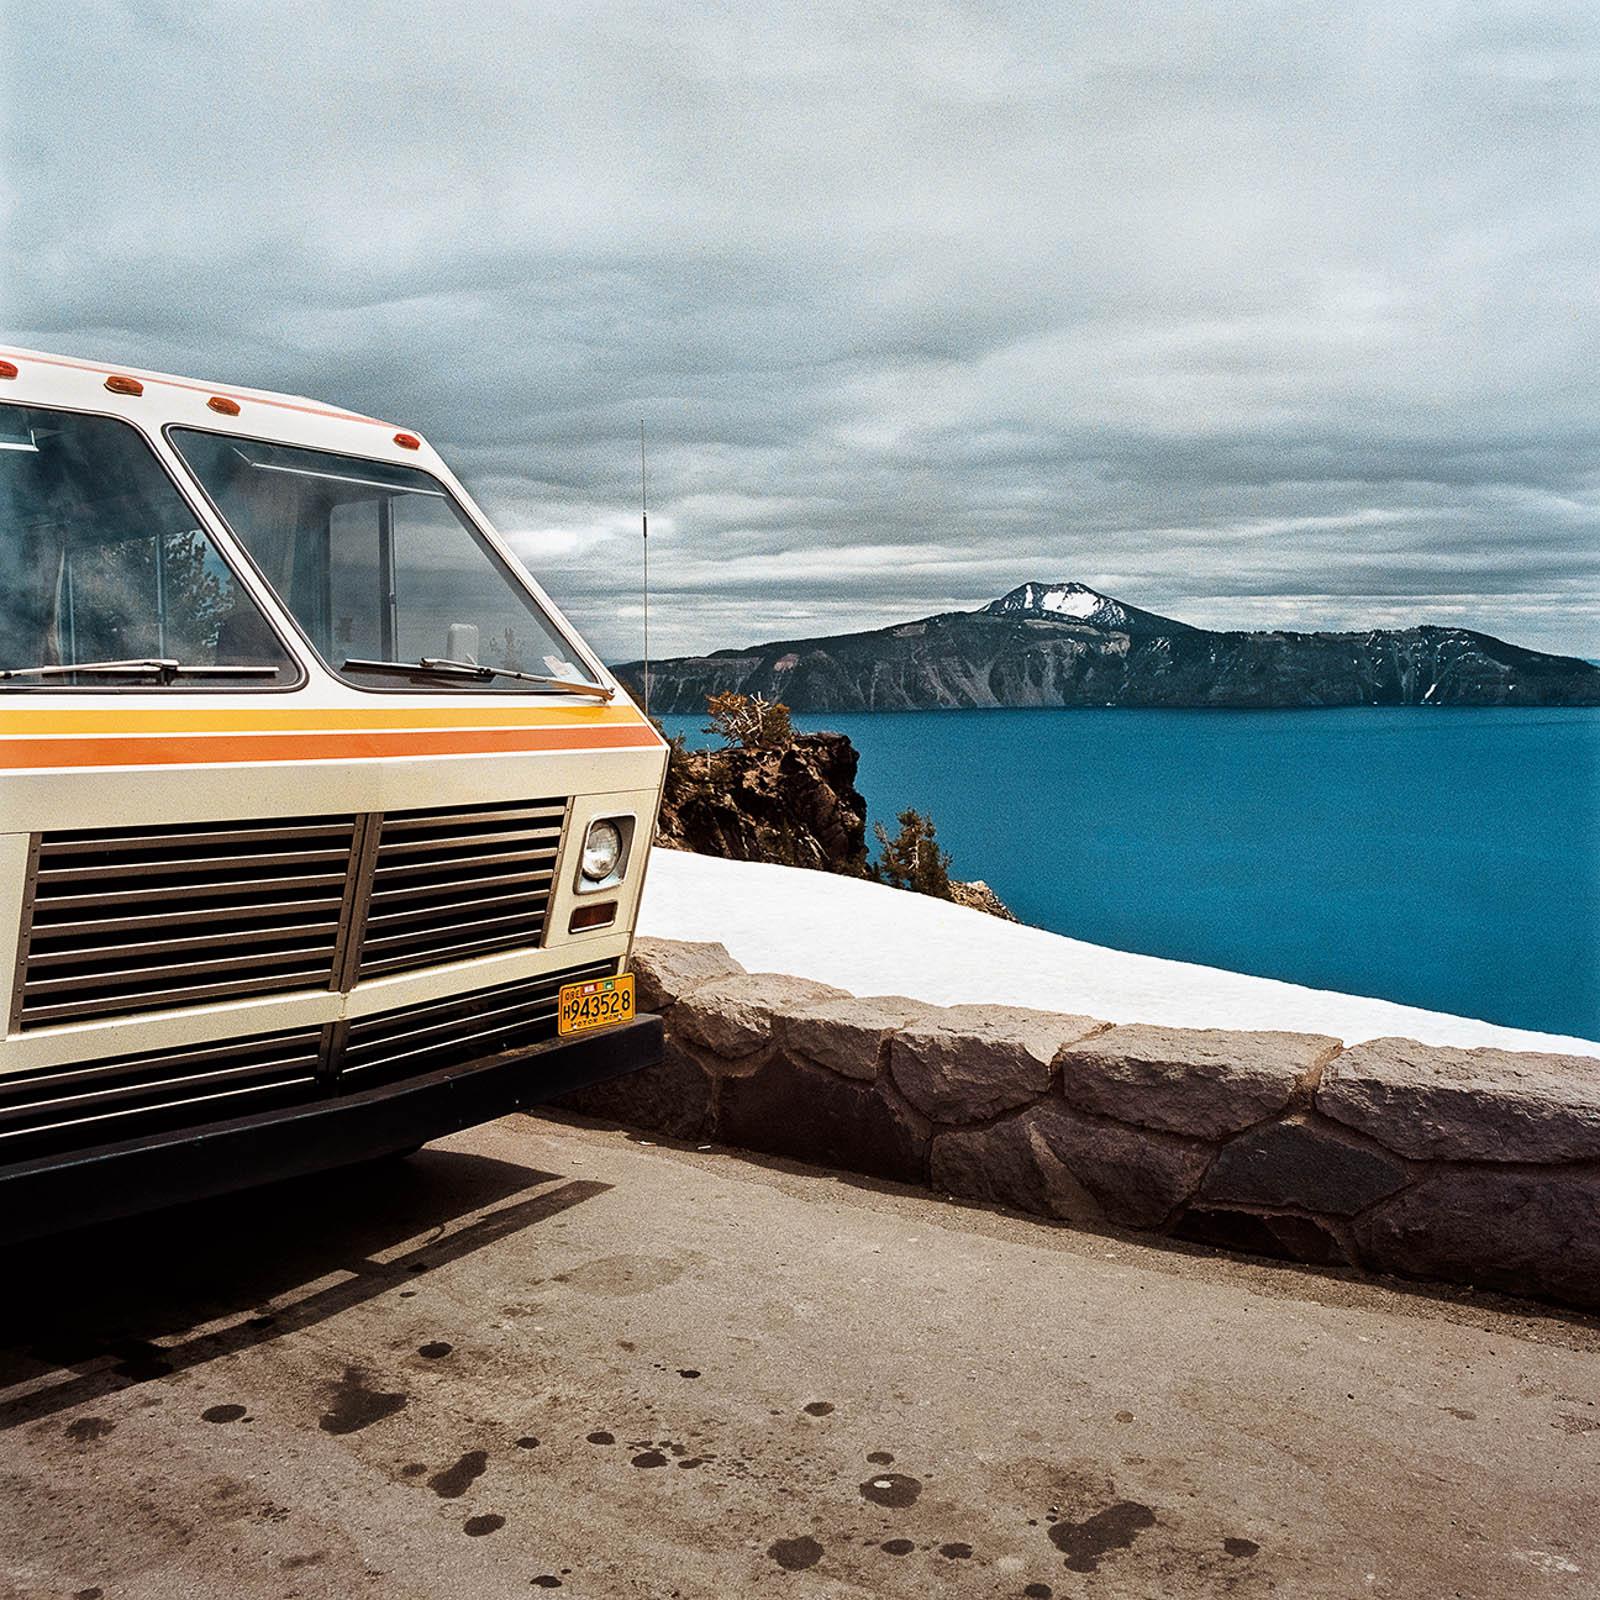 Motorhome at Crater Lake National Park, Oregon 1980